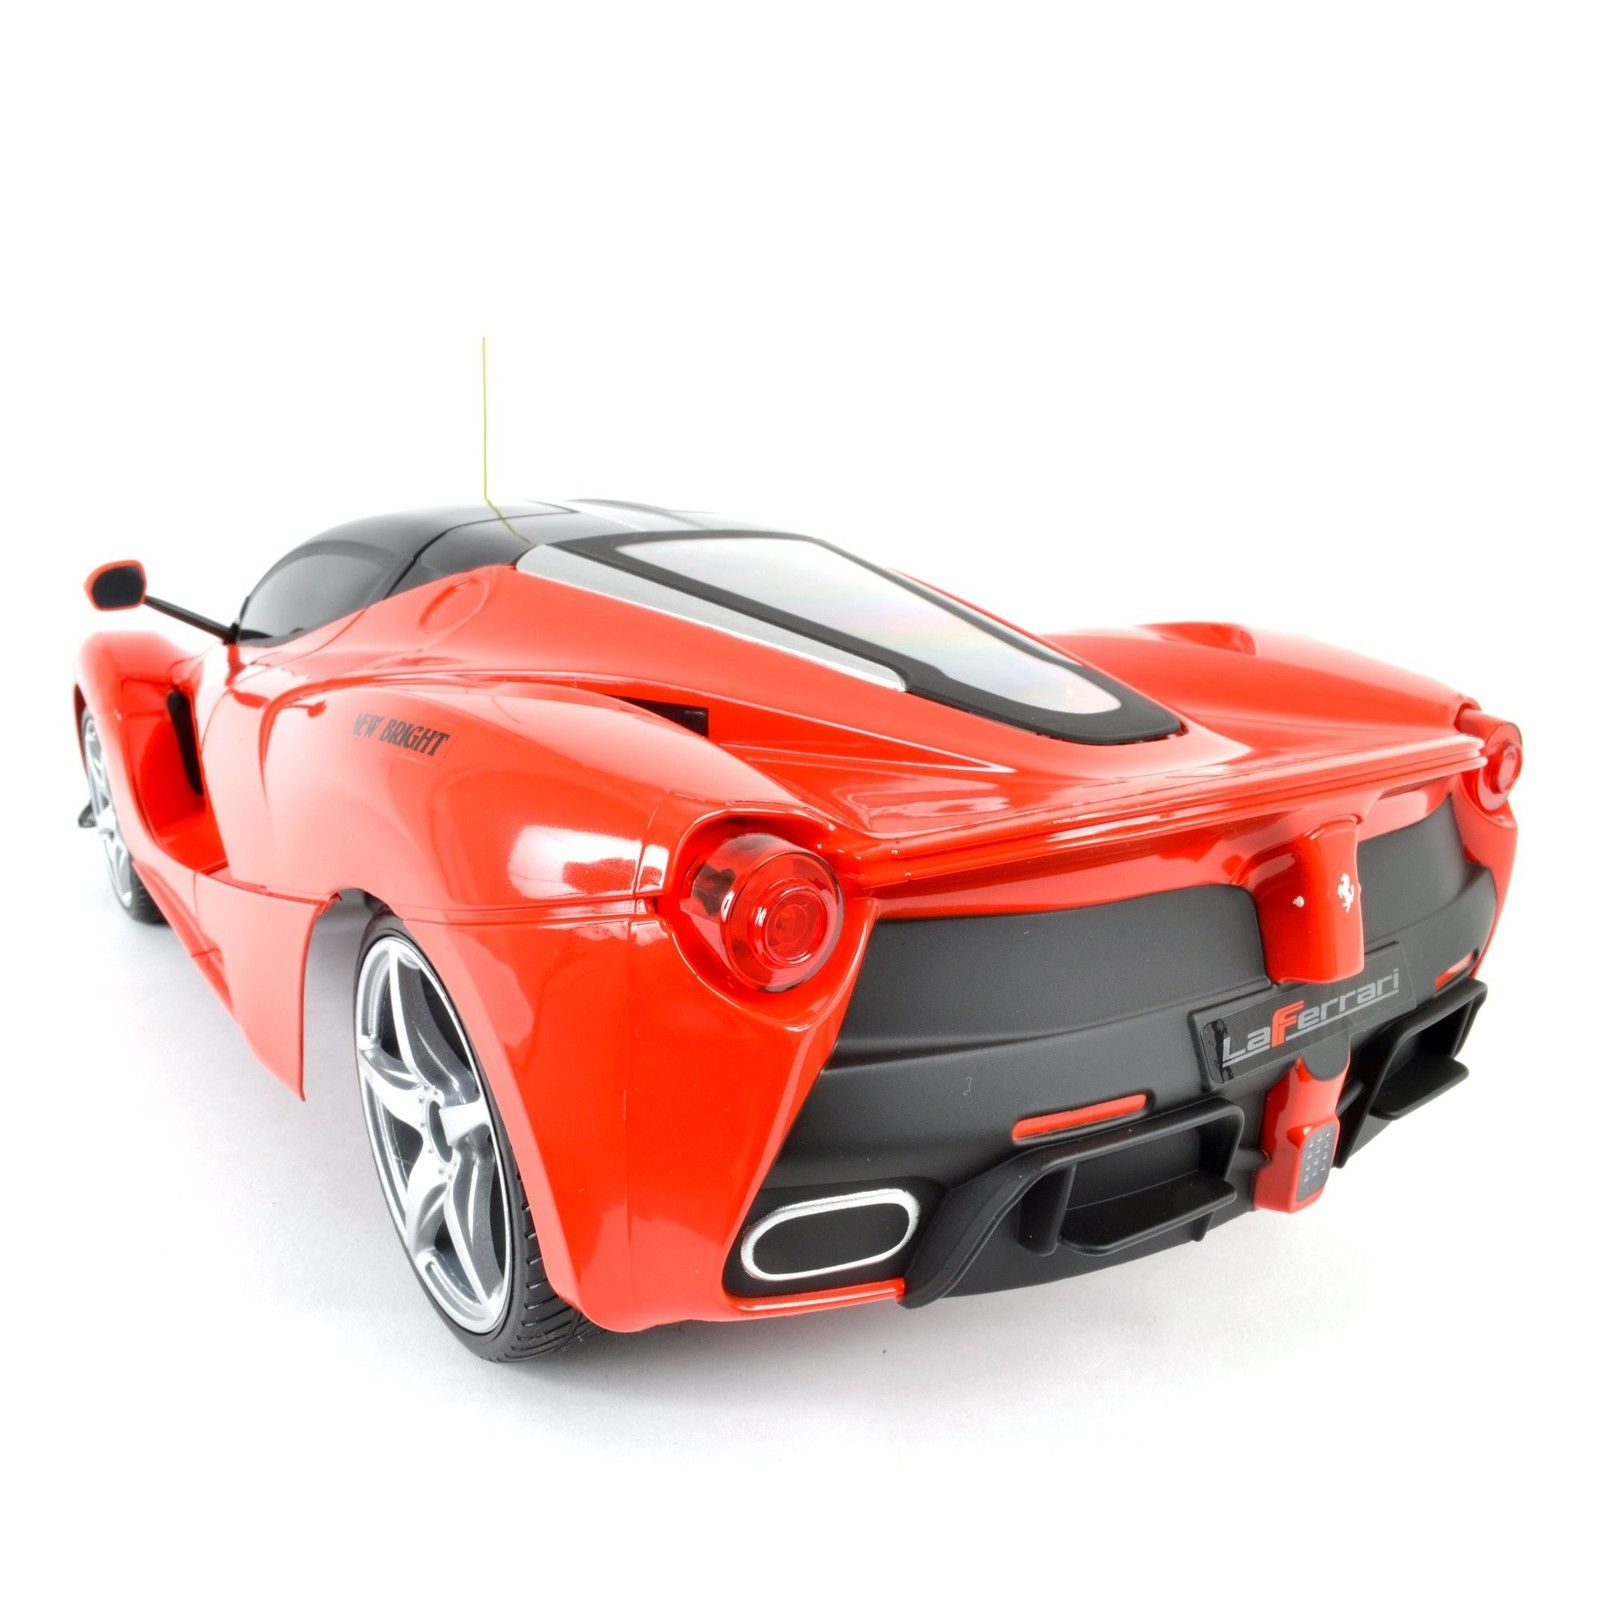 Gizmo Toy | Rakuten: New Bright Ferrari LaFerrari, RC Showcase ... on ferrari logo, ferrari electric car, ferrari f100, ferrari f1, ferrari formula 1, ferrari meme, ferrari cop car, ferrari f1000, ferrari lamborghini mix, ferrari laptop, ferrari concept, ferrari ff, ferrari suv, ferrari aliante, ferrari f750, ferrari bike, ferrari ego, ferrari of the future, ferrari f60,